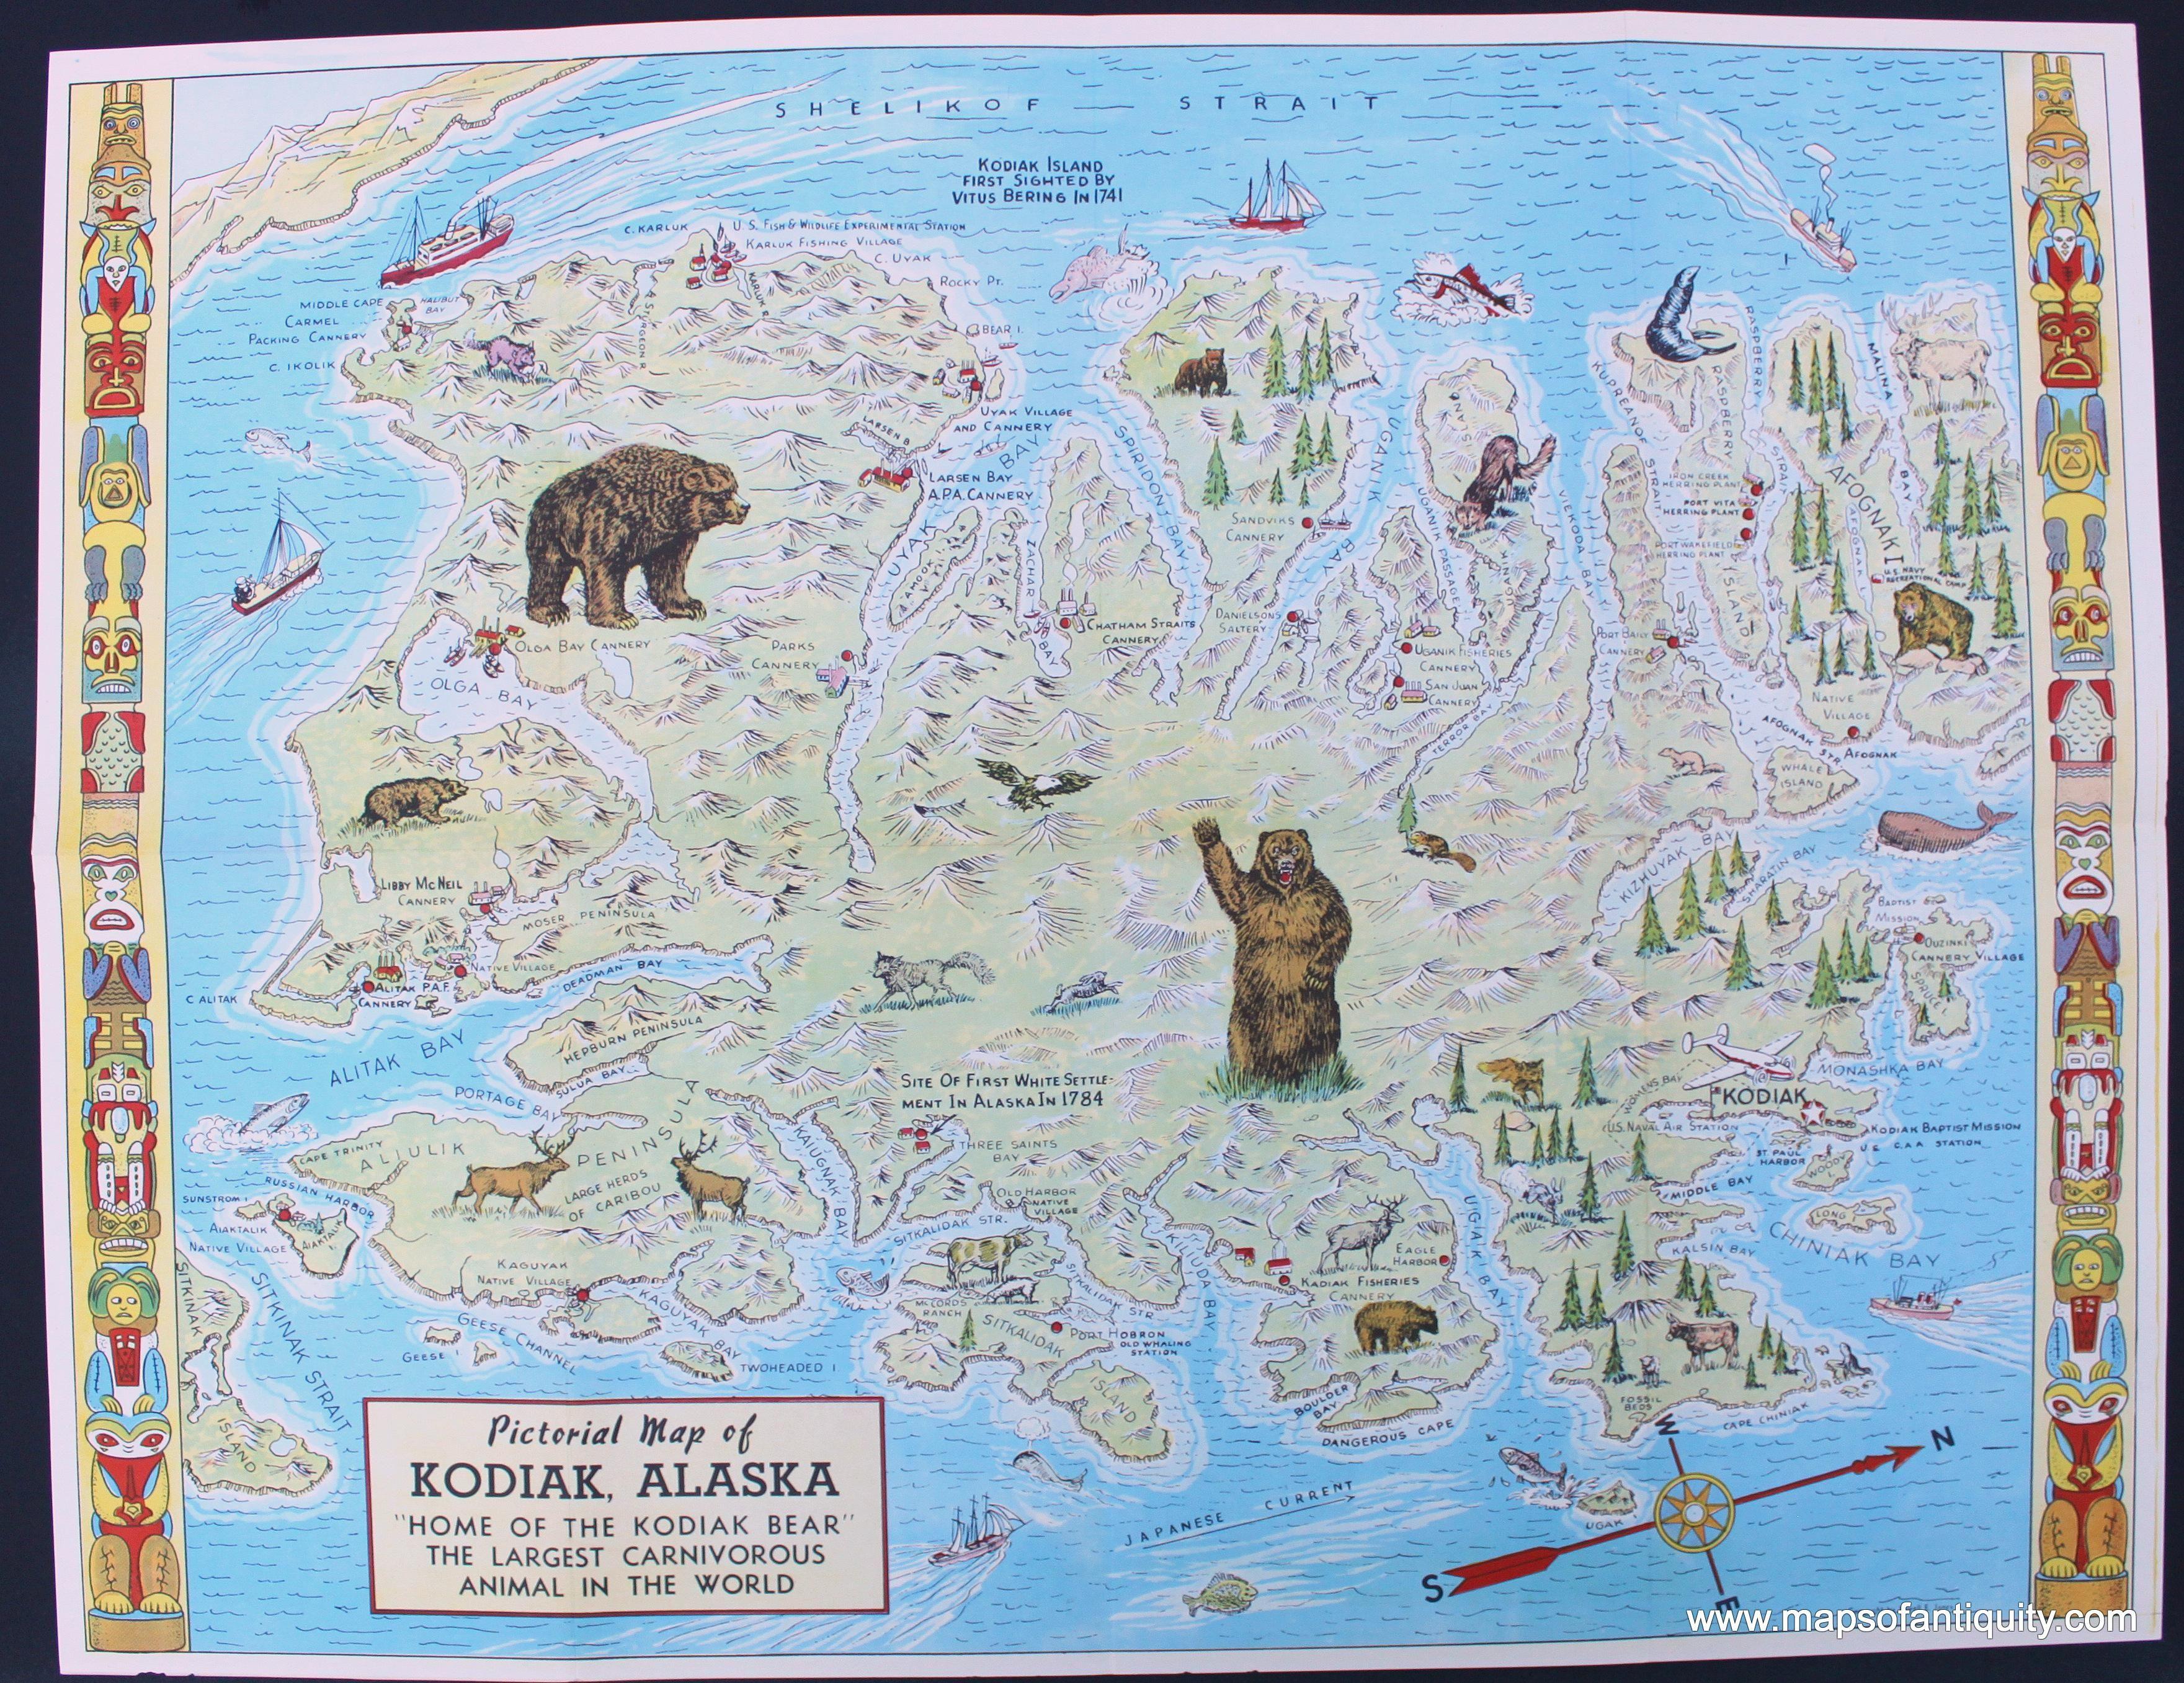 Pictorial Map Of Kodiak Island Alaska